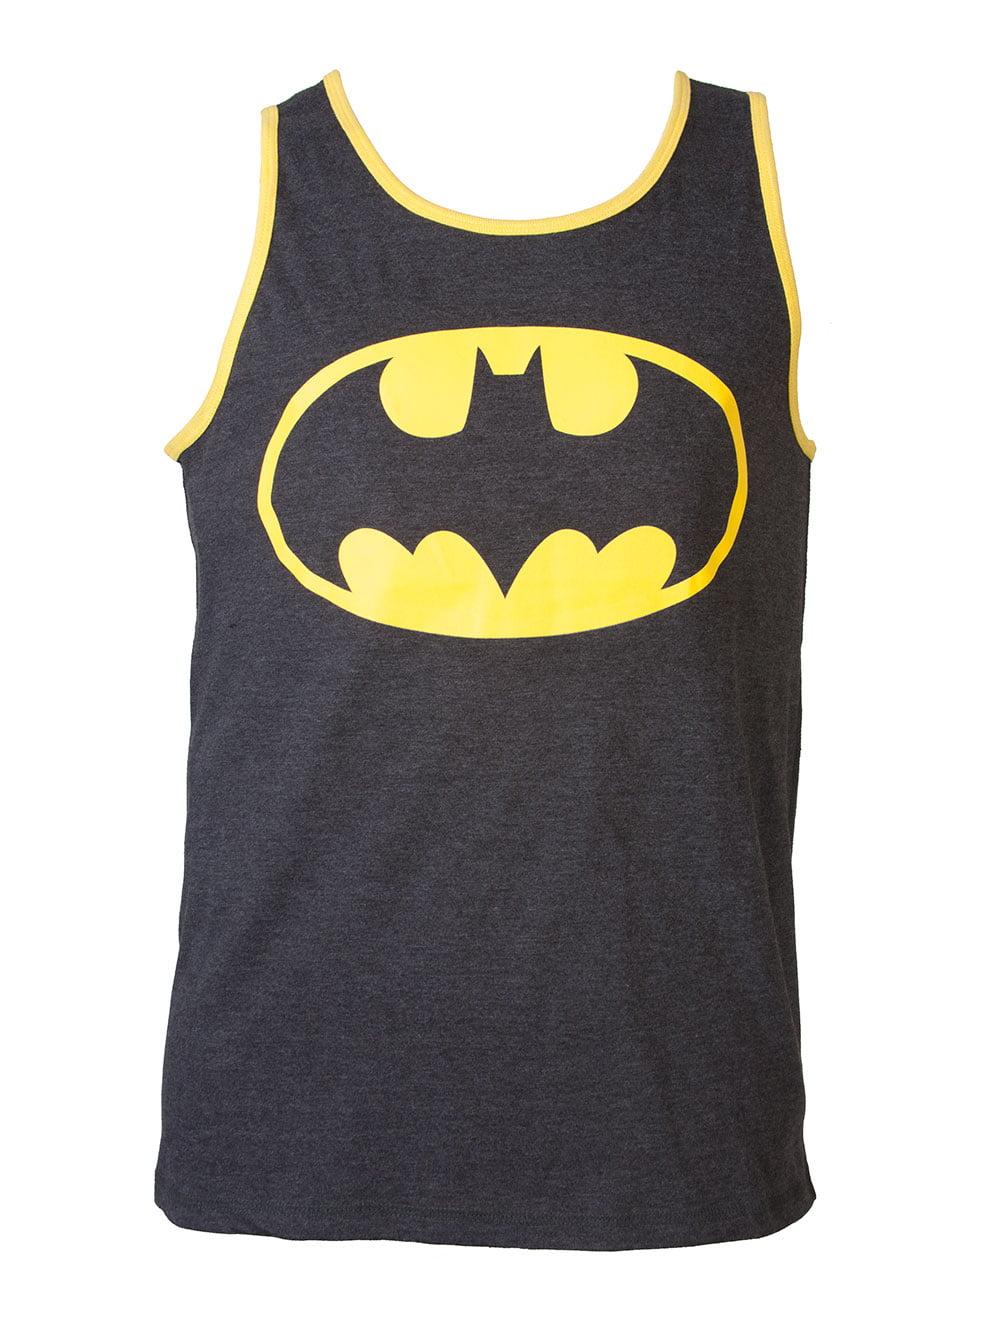 Mens Batman Reversible Tank Top by